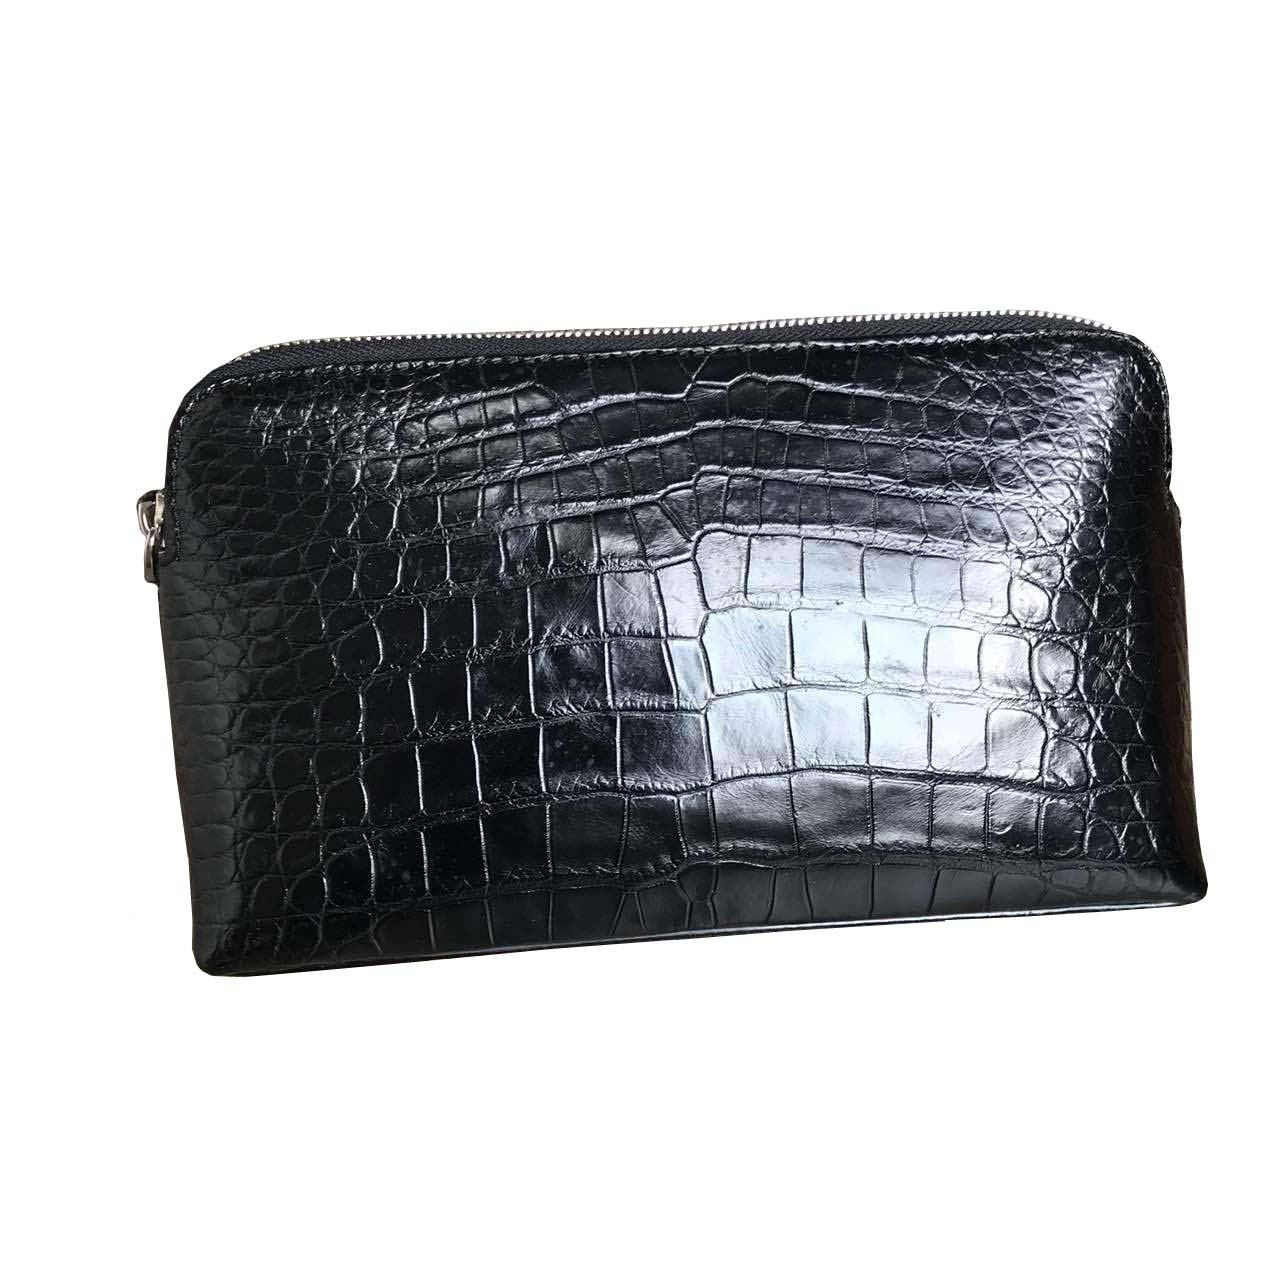 hongsen new  crocodile  Hand bag  belly  male  true  crocodile bag large capacity  Hand caught bag  Men clutch bag